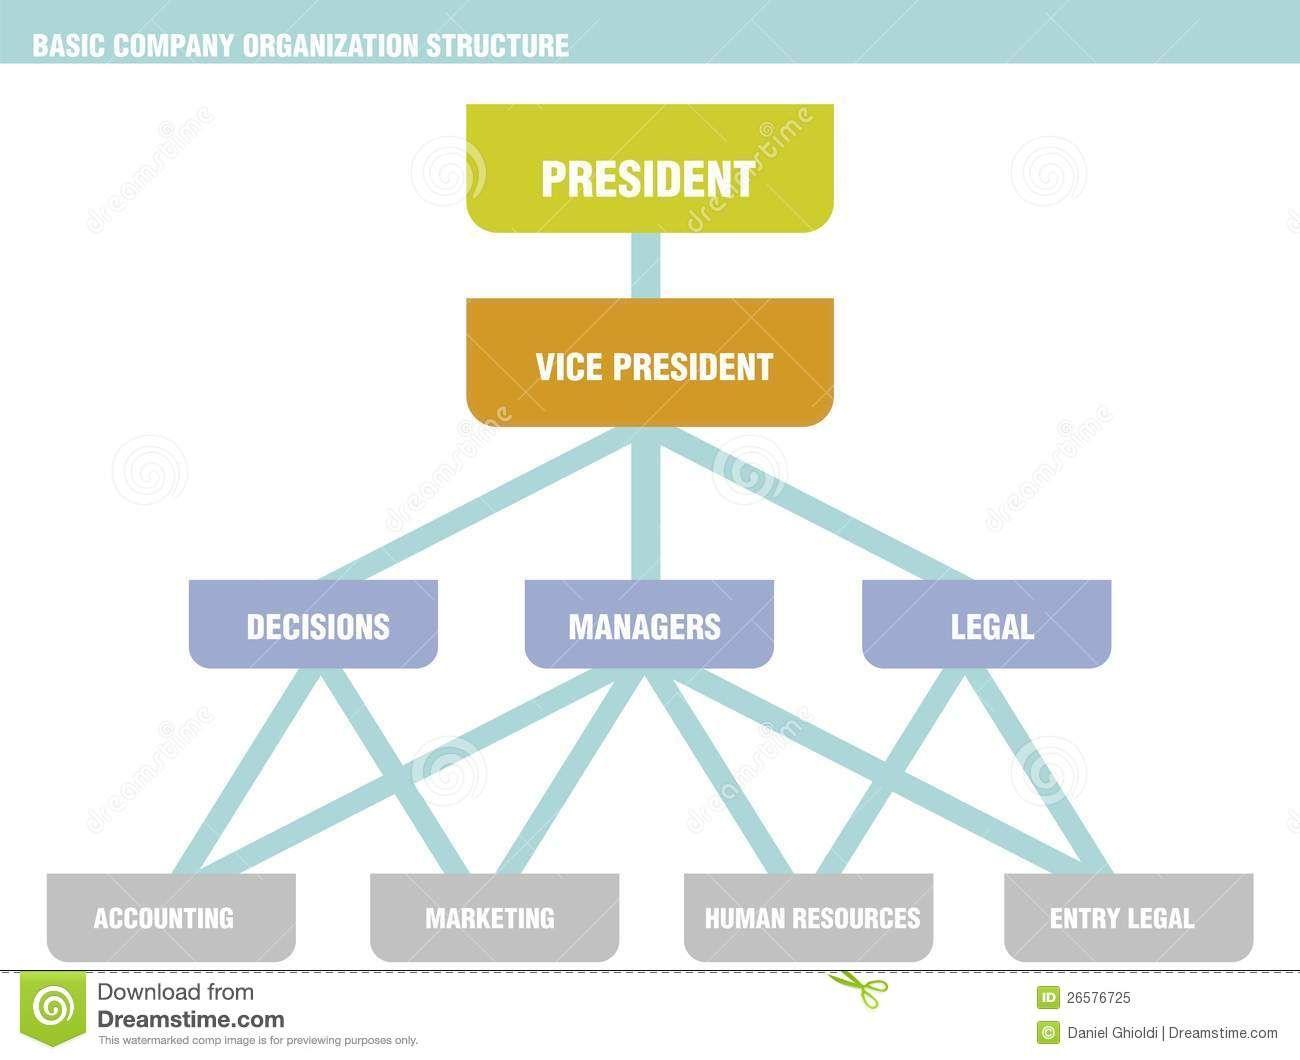 BasicCompanyOrganizationStructureChartJpg